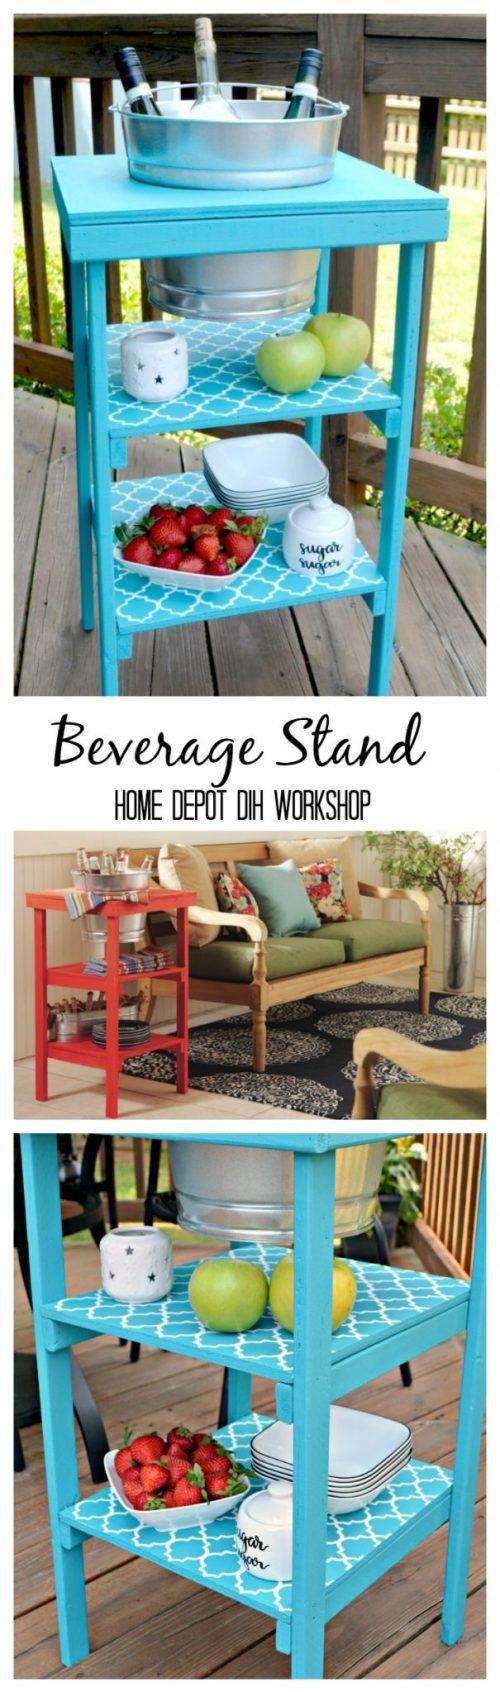 Beverage Stand DIH Workshop